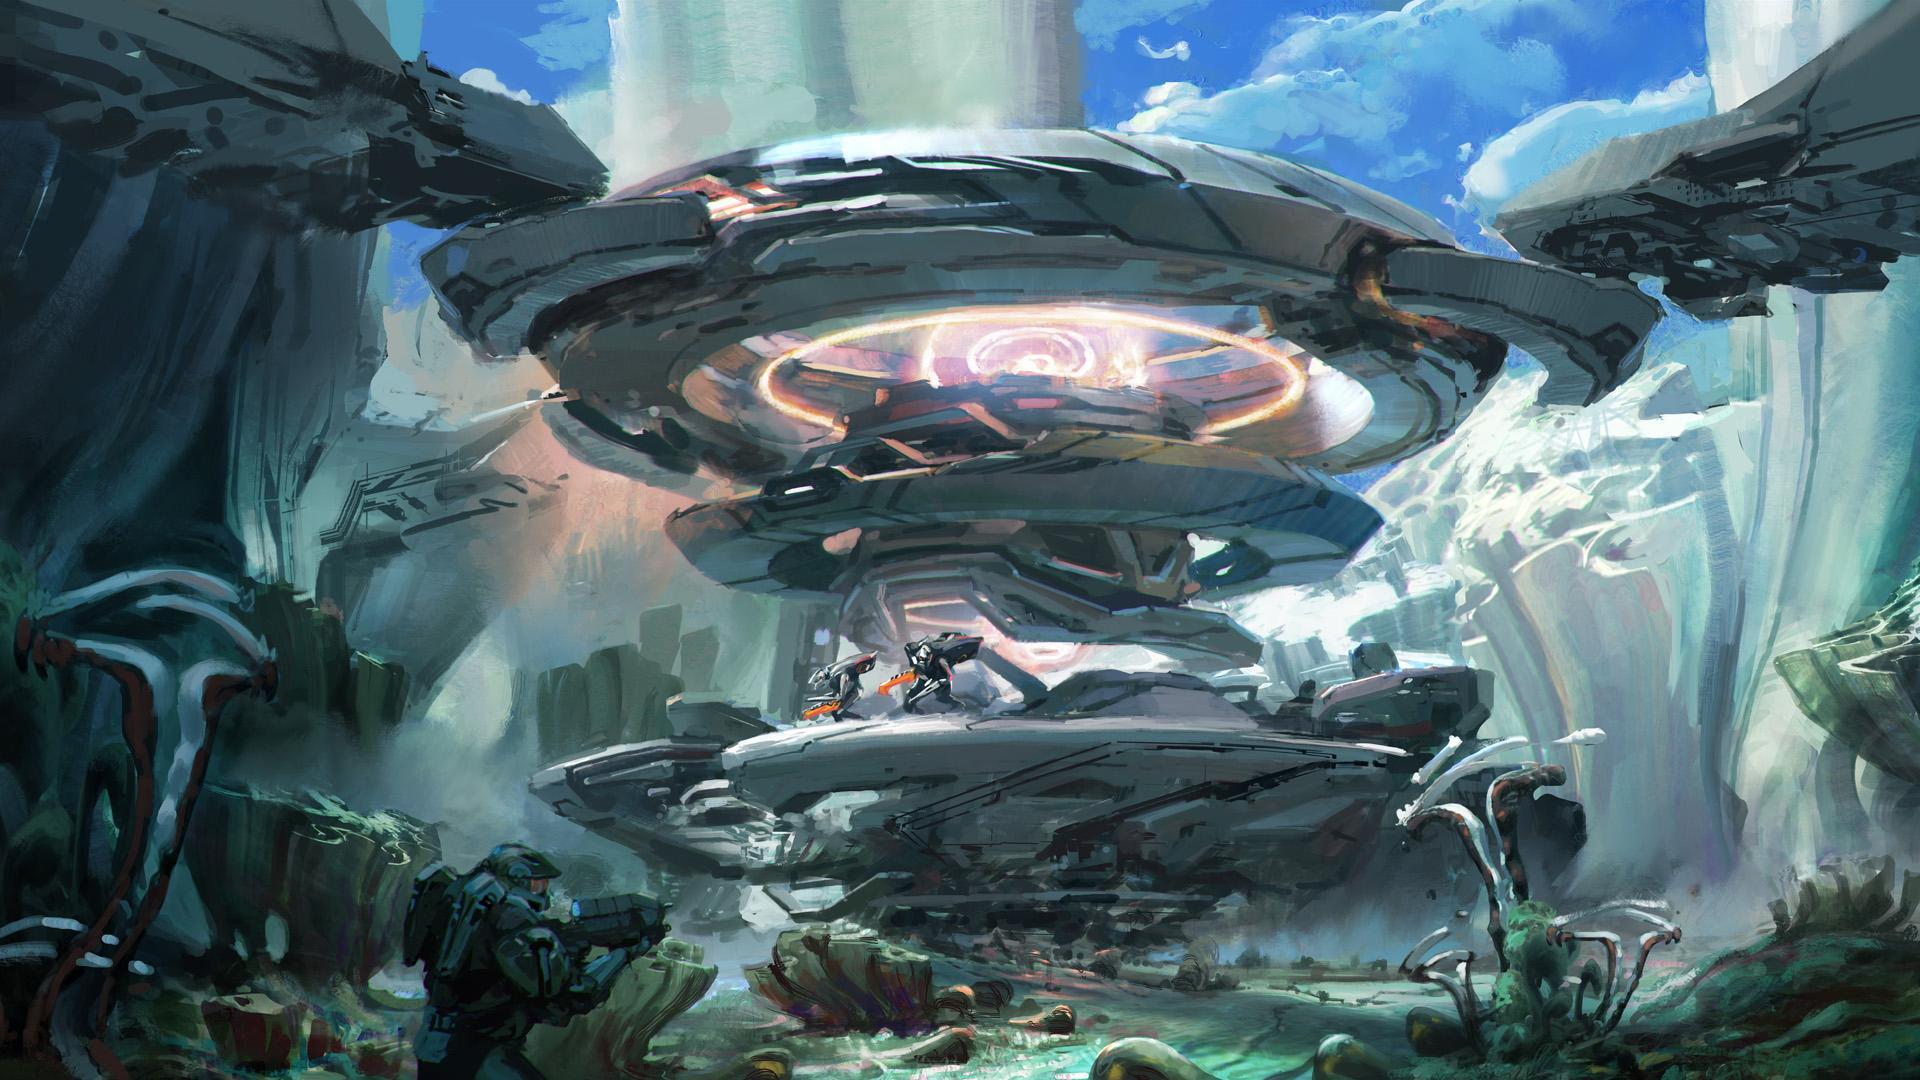 Wallpaper 1920x1080 px artwork concept art fantasy - Halo 5 guardians wallpaper 1920x1080 ...